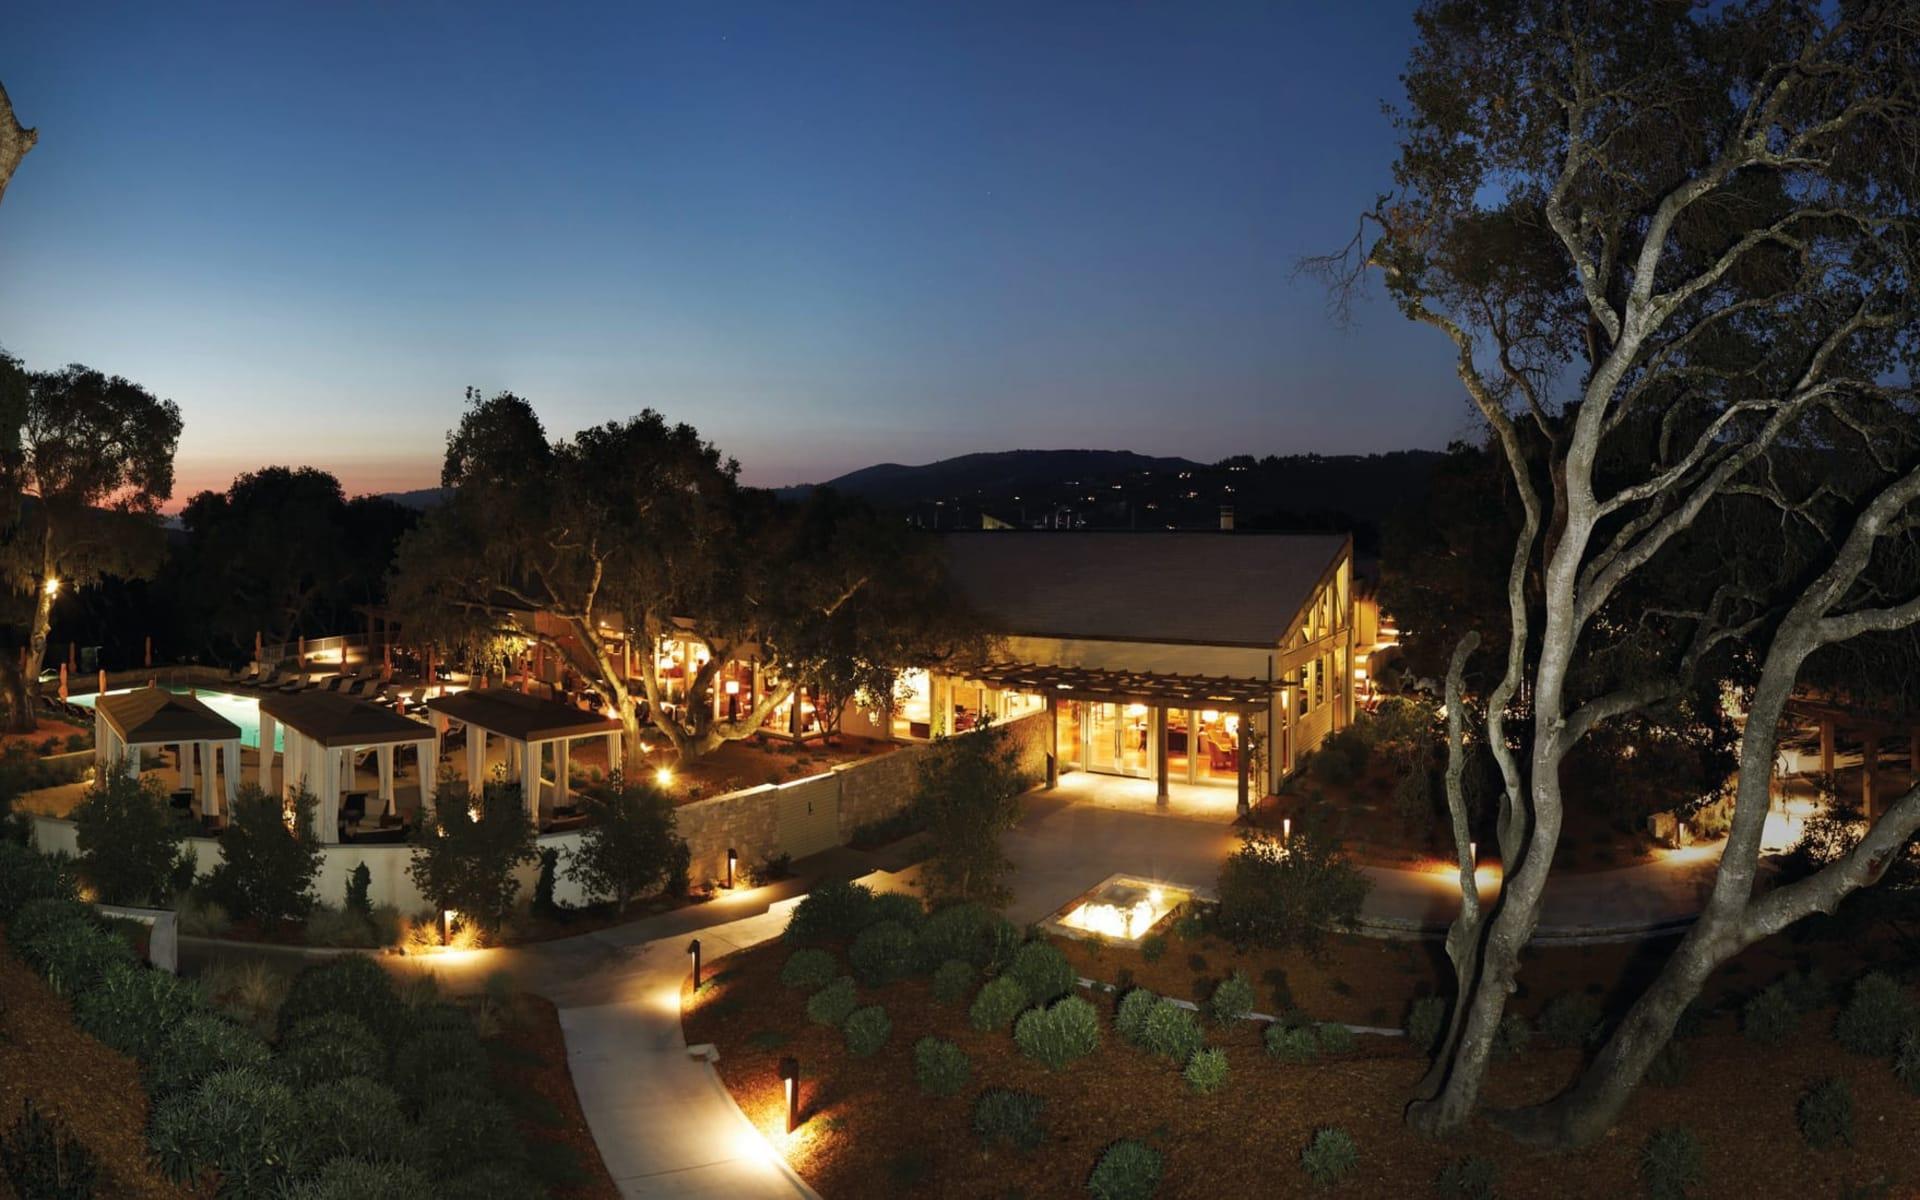 Carmel Valley Ranch: Exterior_Carmel Valley Ranch_Aussenansicht bei Nacht_Bonotel